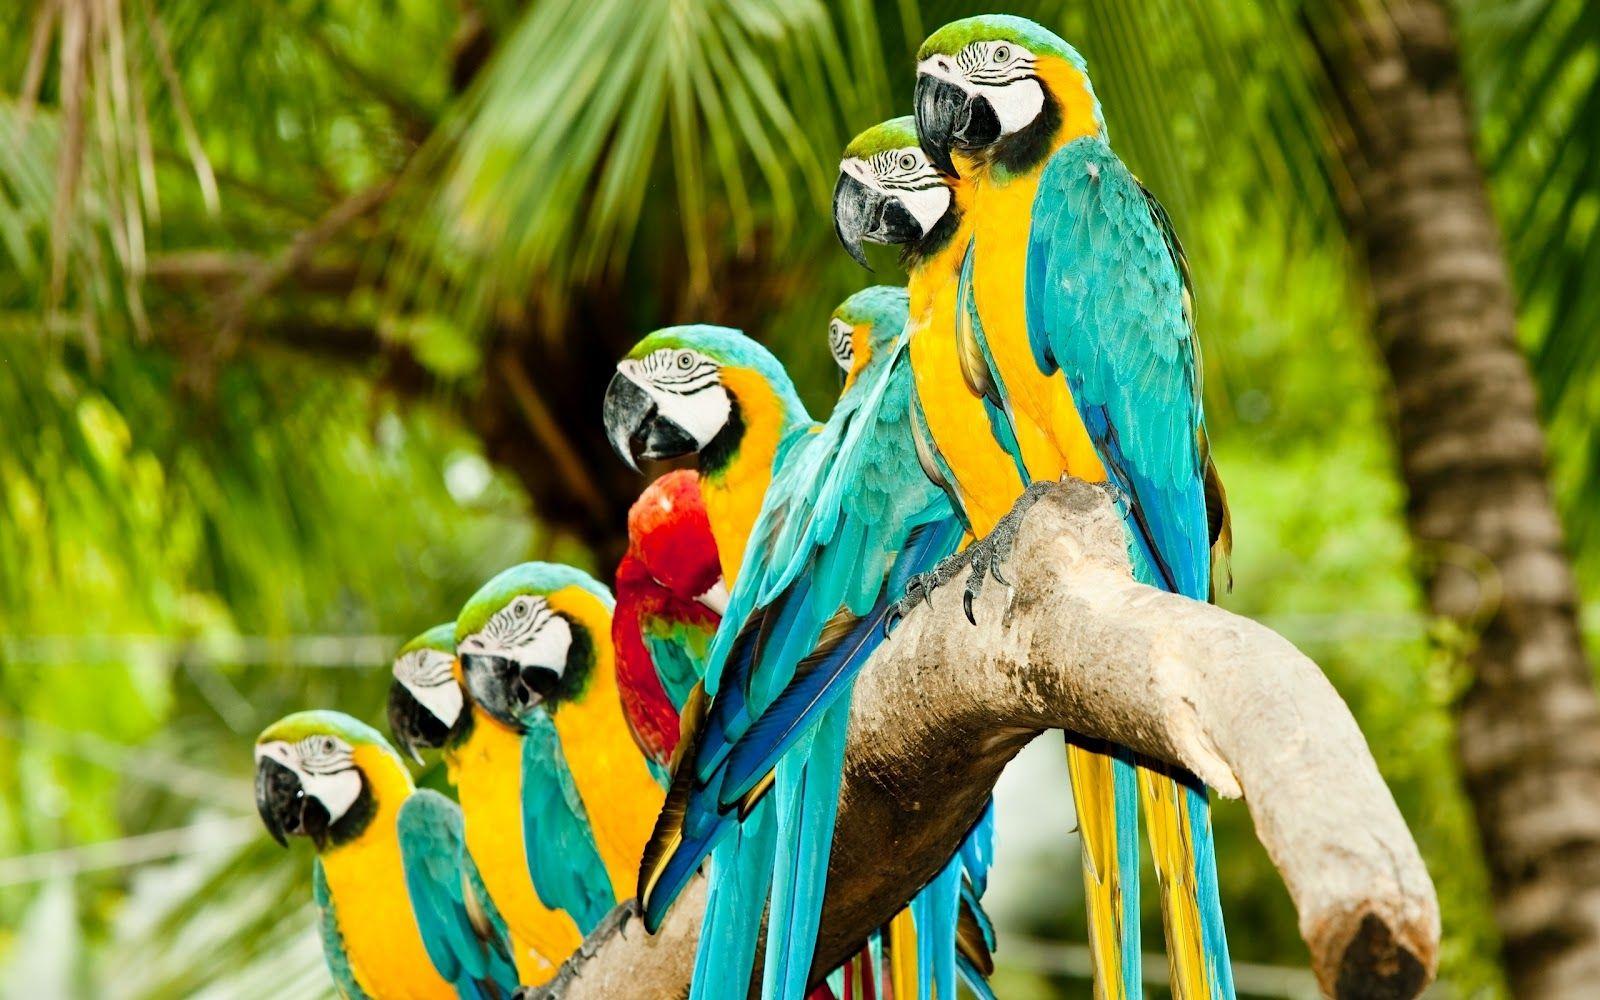 birds wallpaper download free